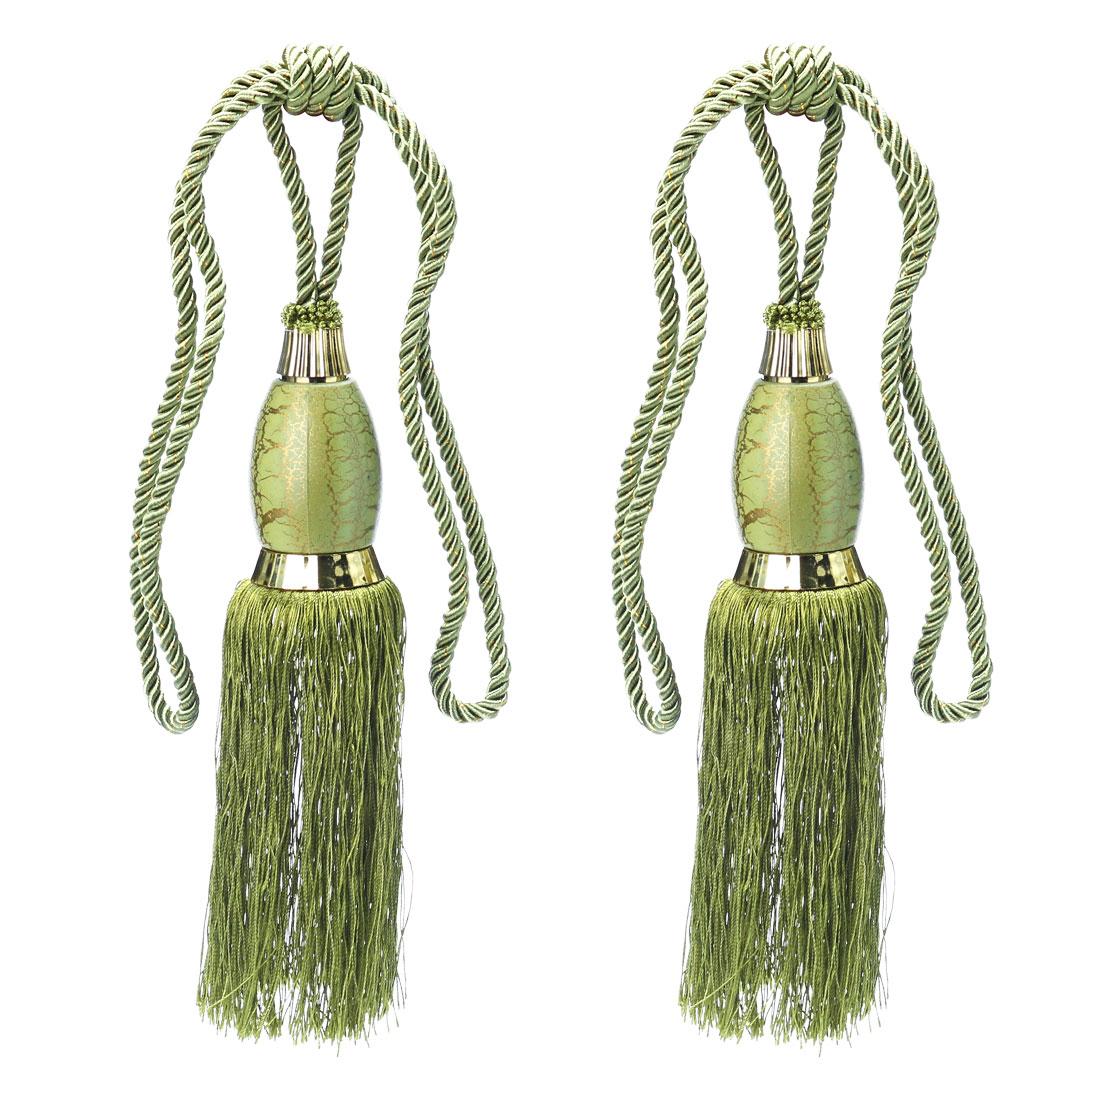 2Pcs Window Curtain Drapery Tassel Rope Tie Back Holdback Fringe Forest Green